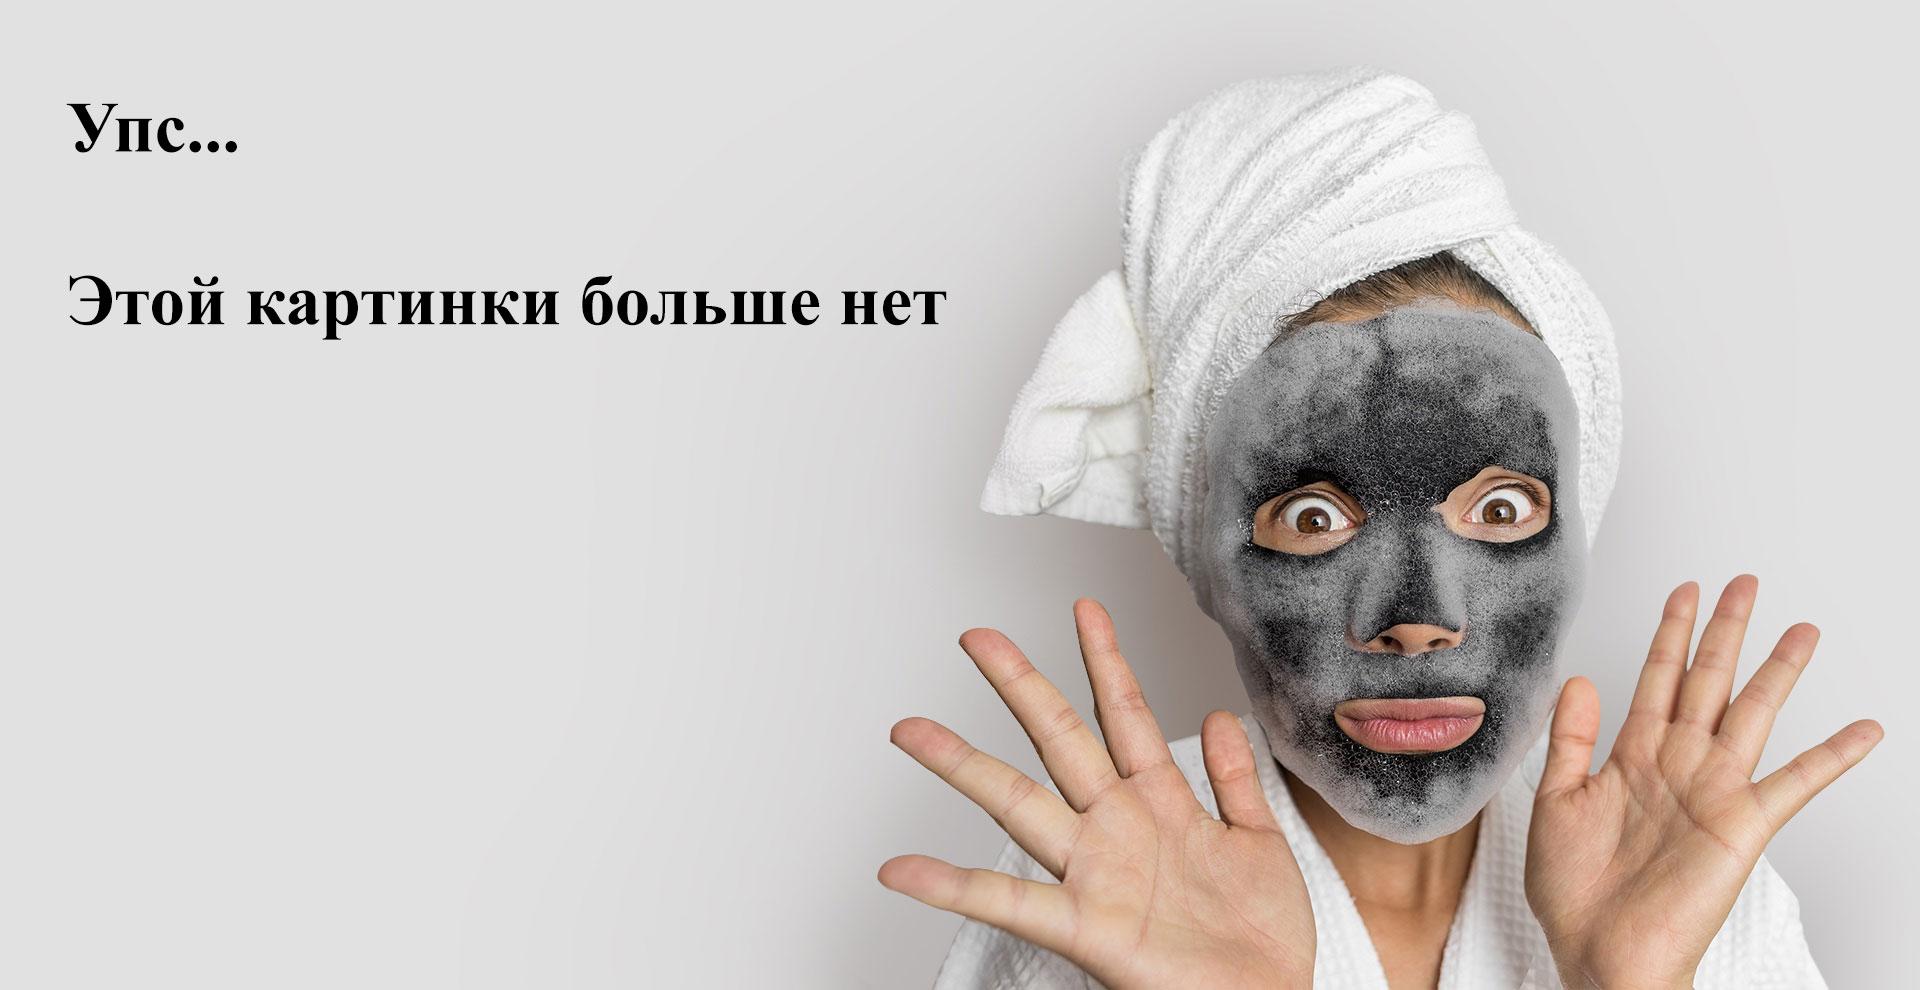 Markell, Сыворотка-эликсир для лица Skin&City «Снежный гриб», 10 мл